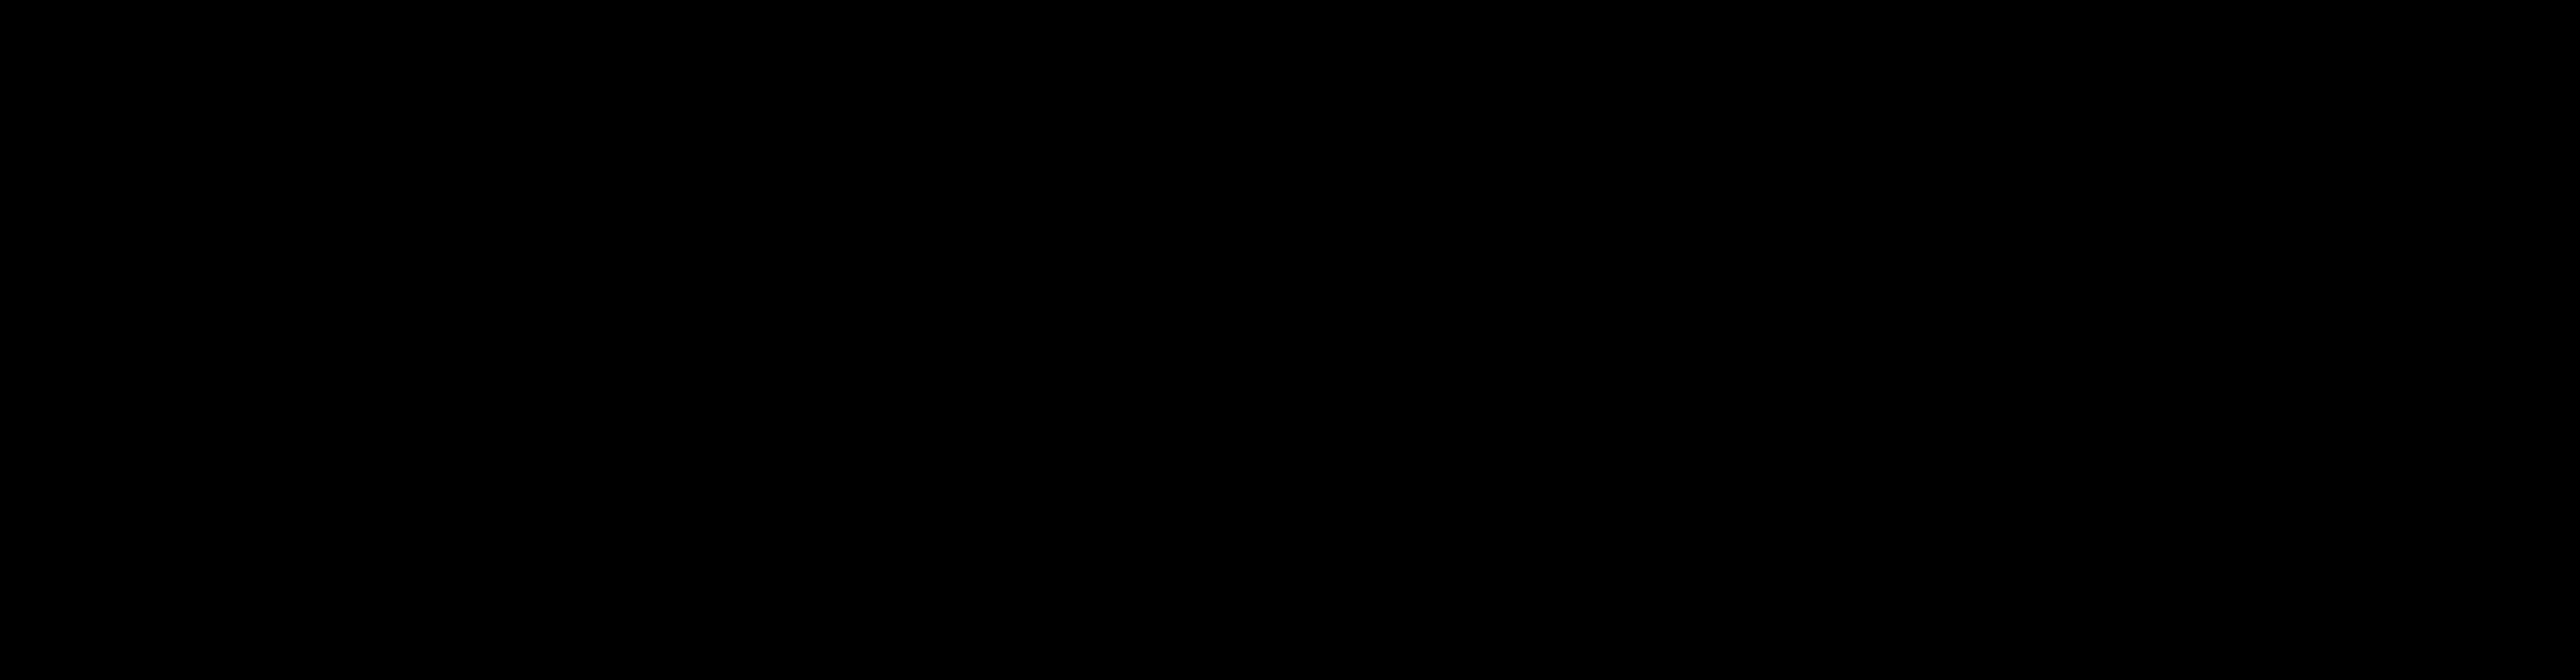 Curcumin-d<sub>6</sub>-β-D-glucuronide